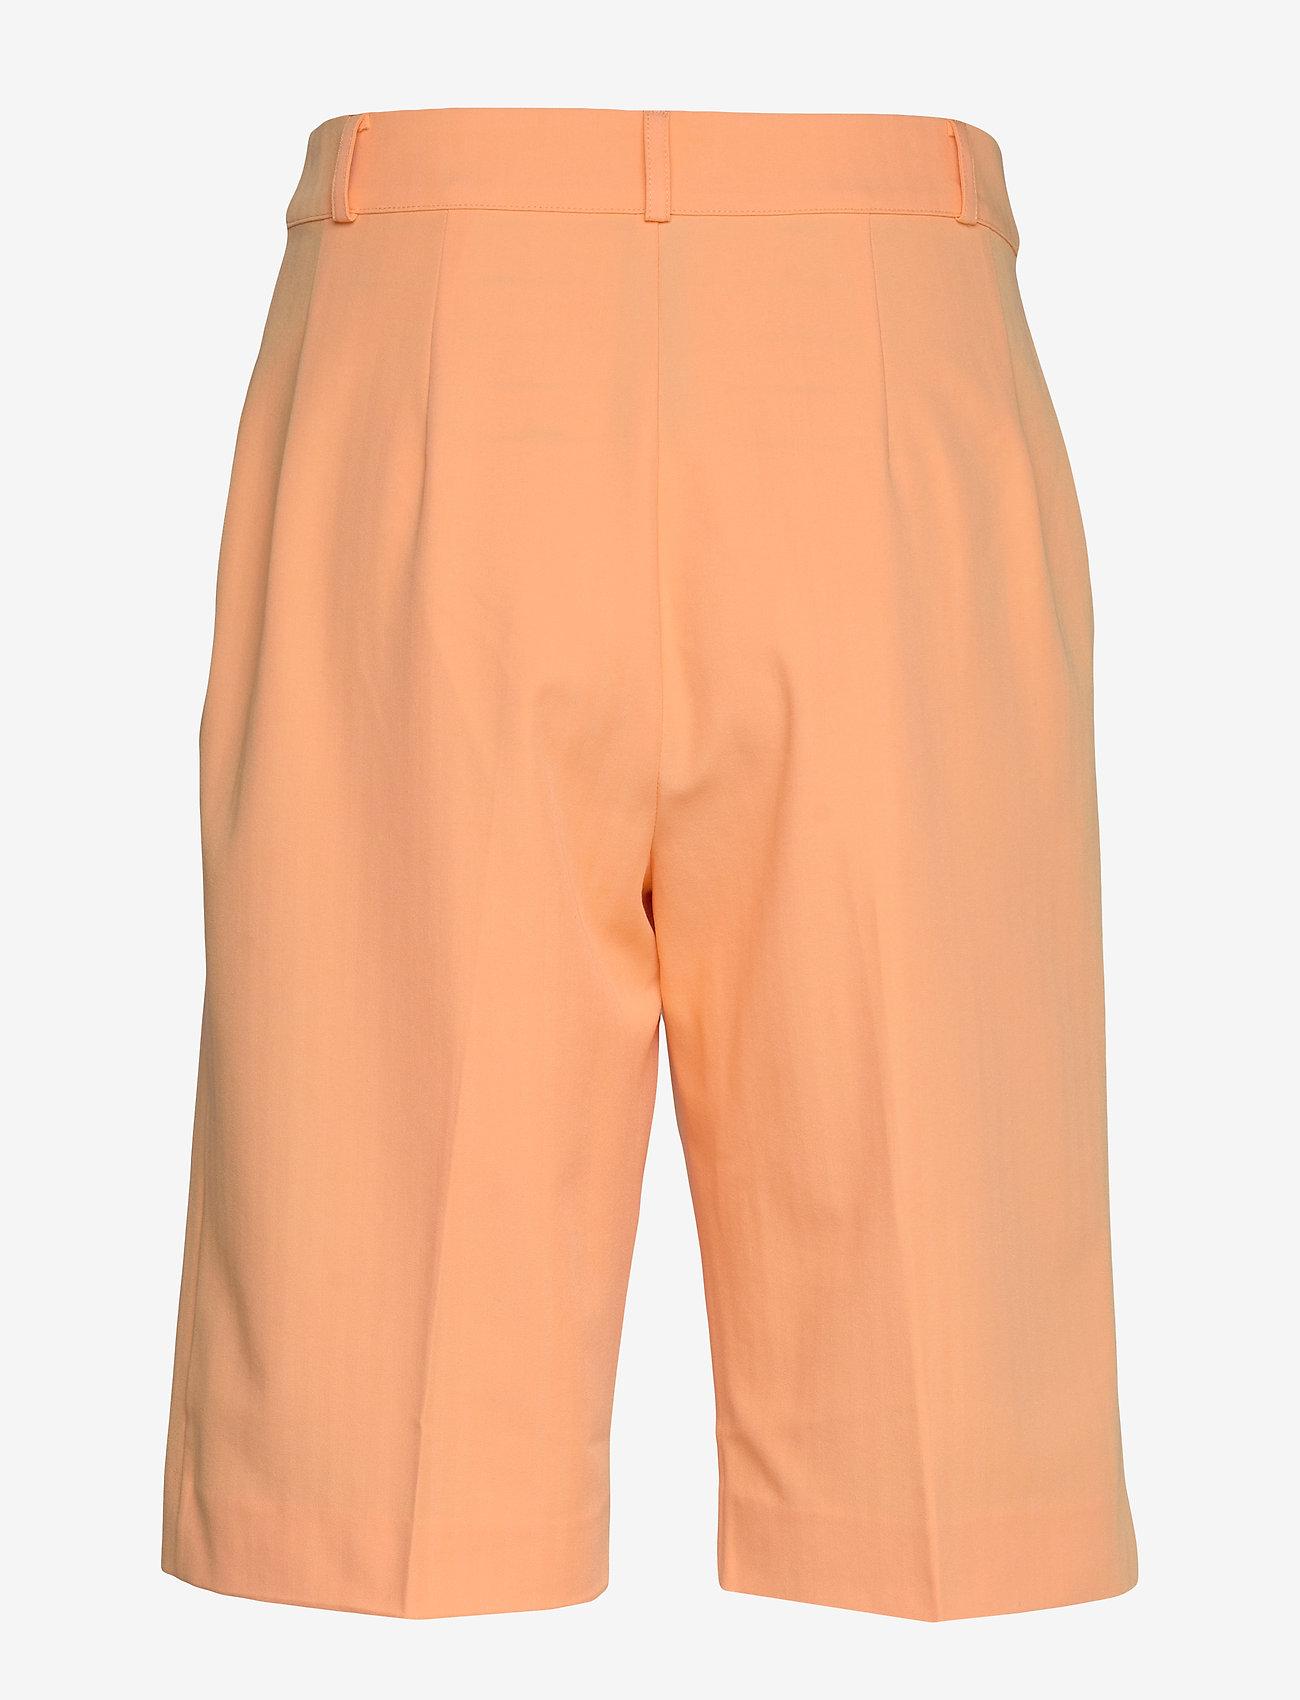 Enretna Shorts 6726 (Salmon Buff) (416 kr) - Envii